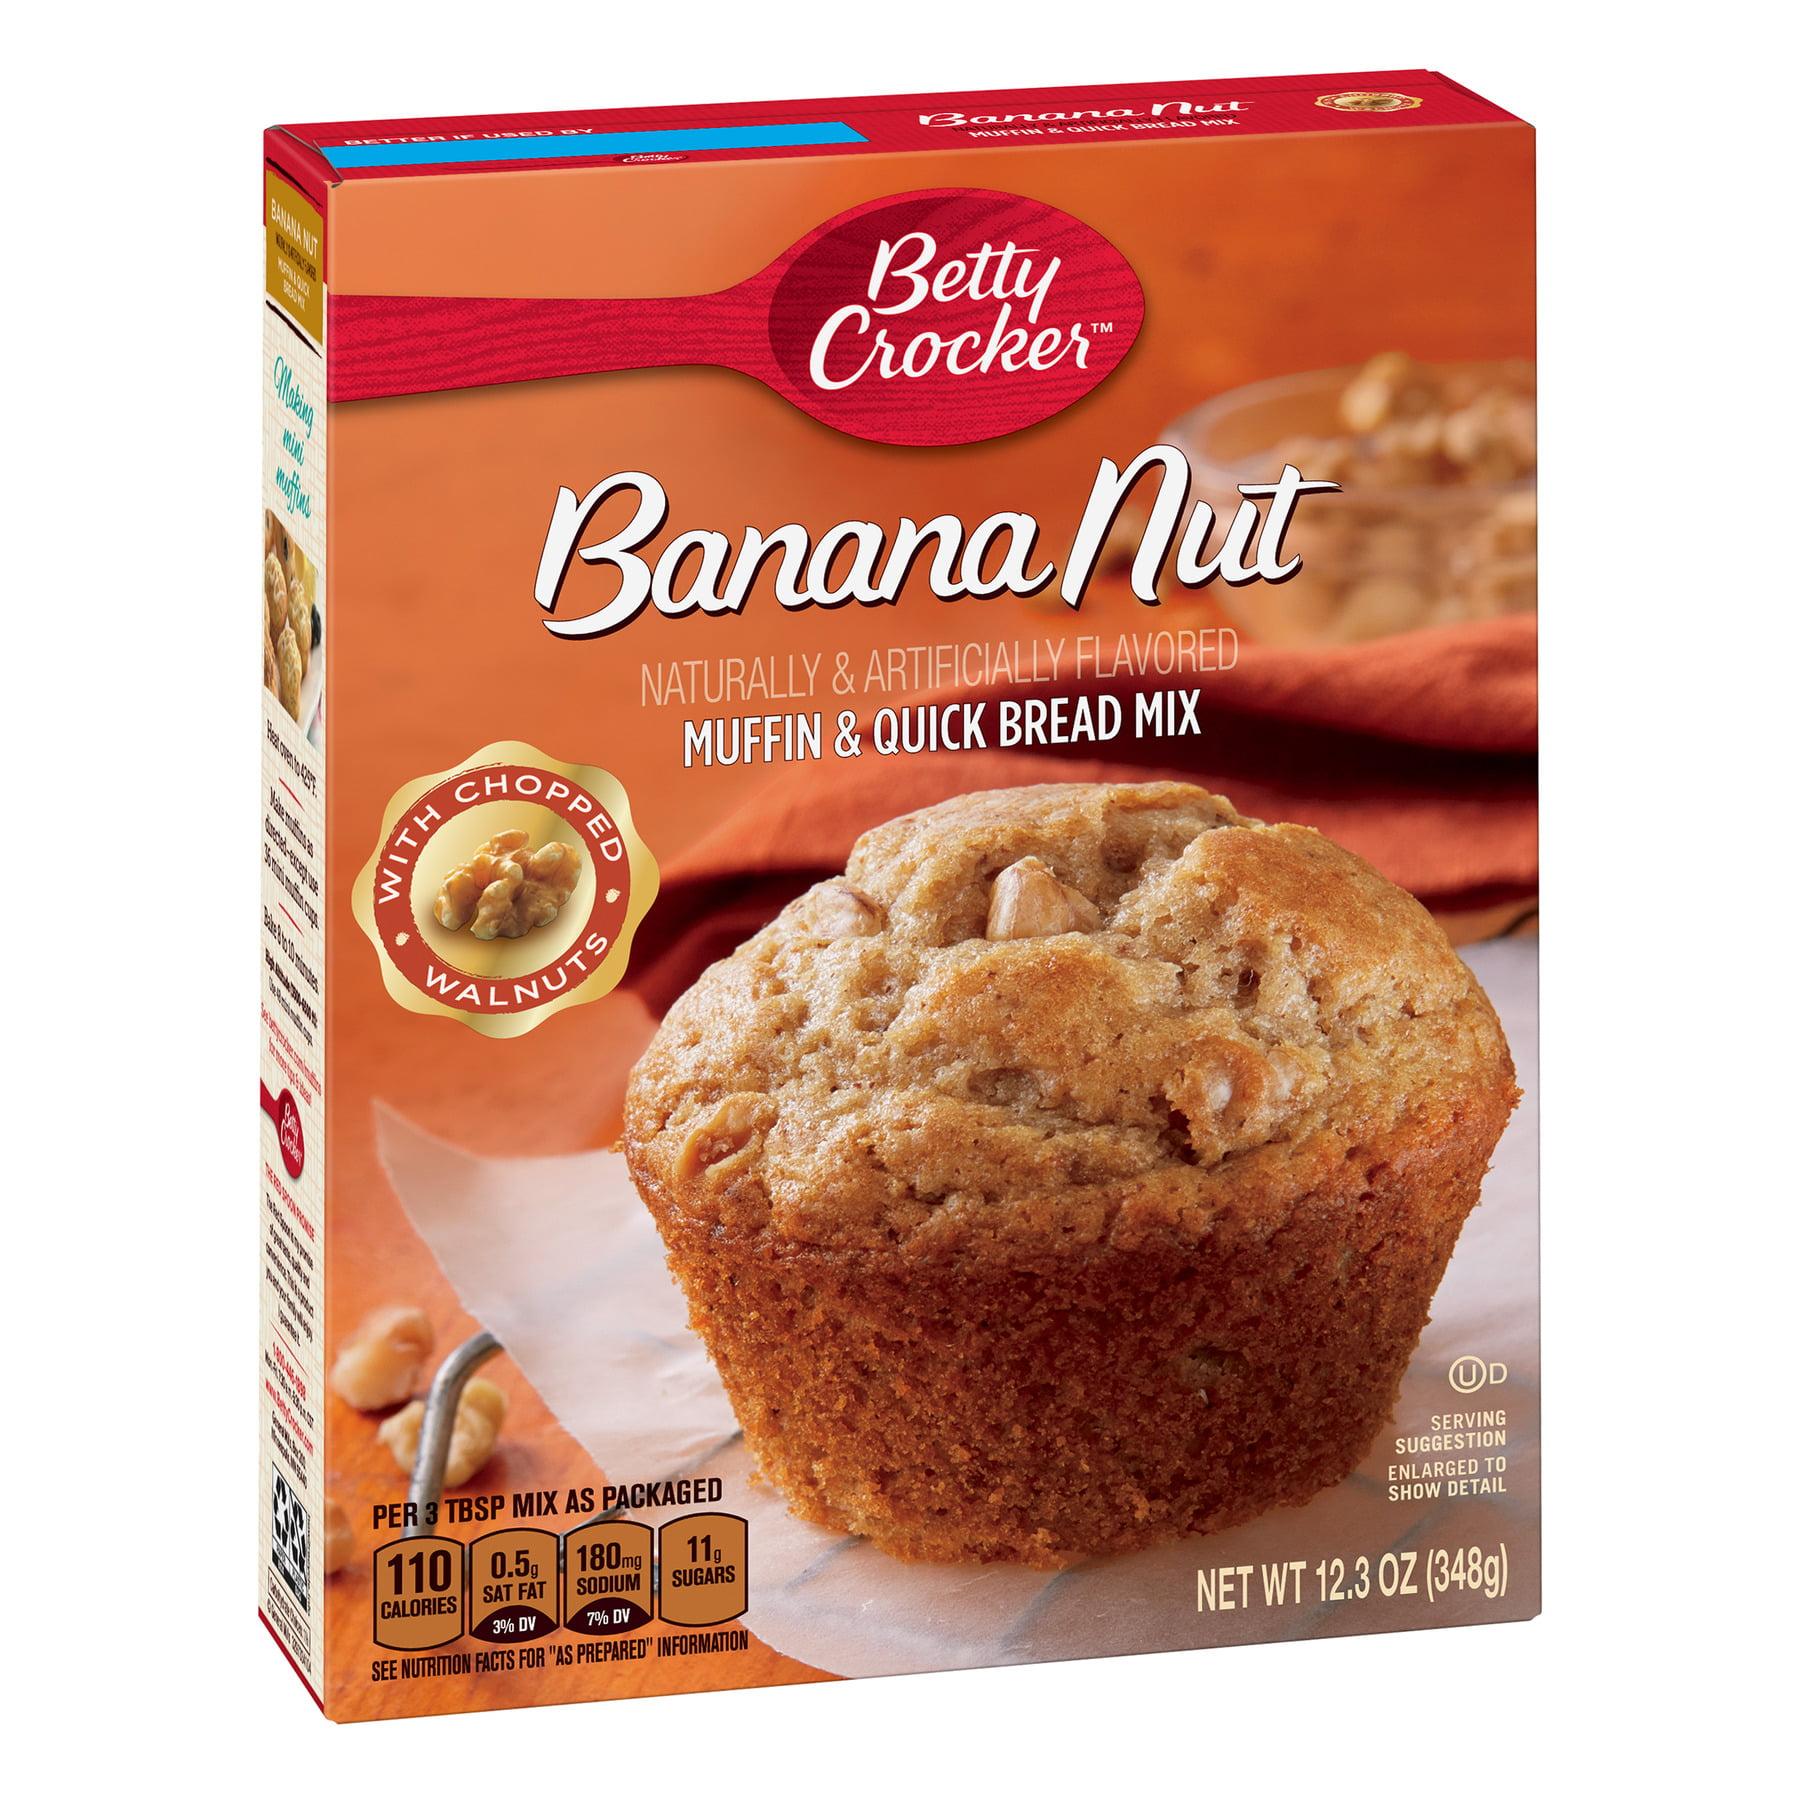 Betty Crocker Banana Nut Muffin And Quick Bread Mix 12 3 Oz